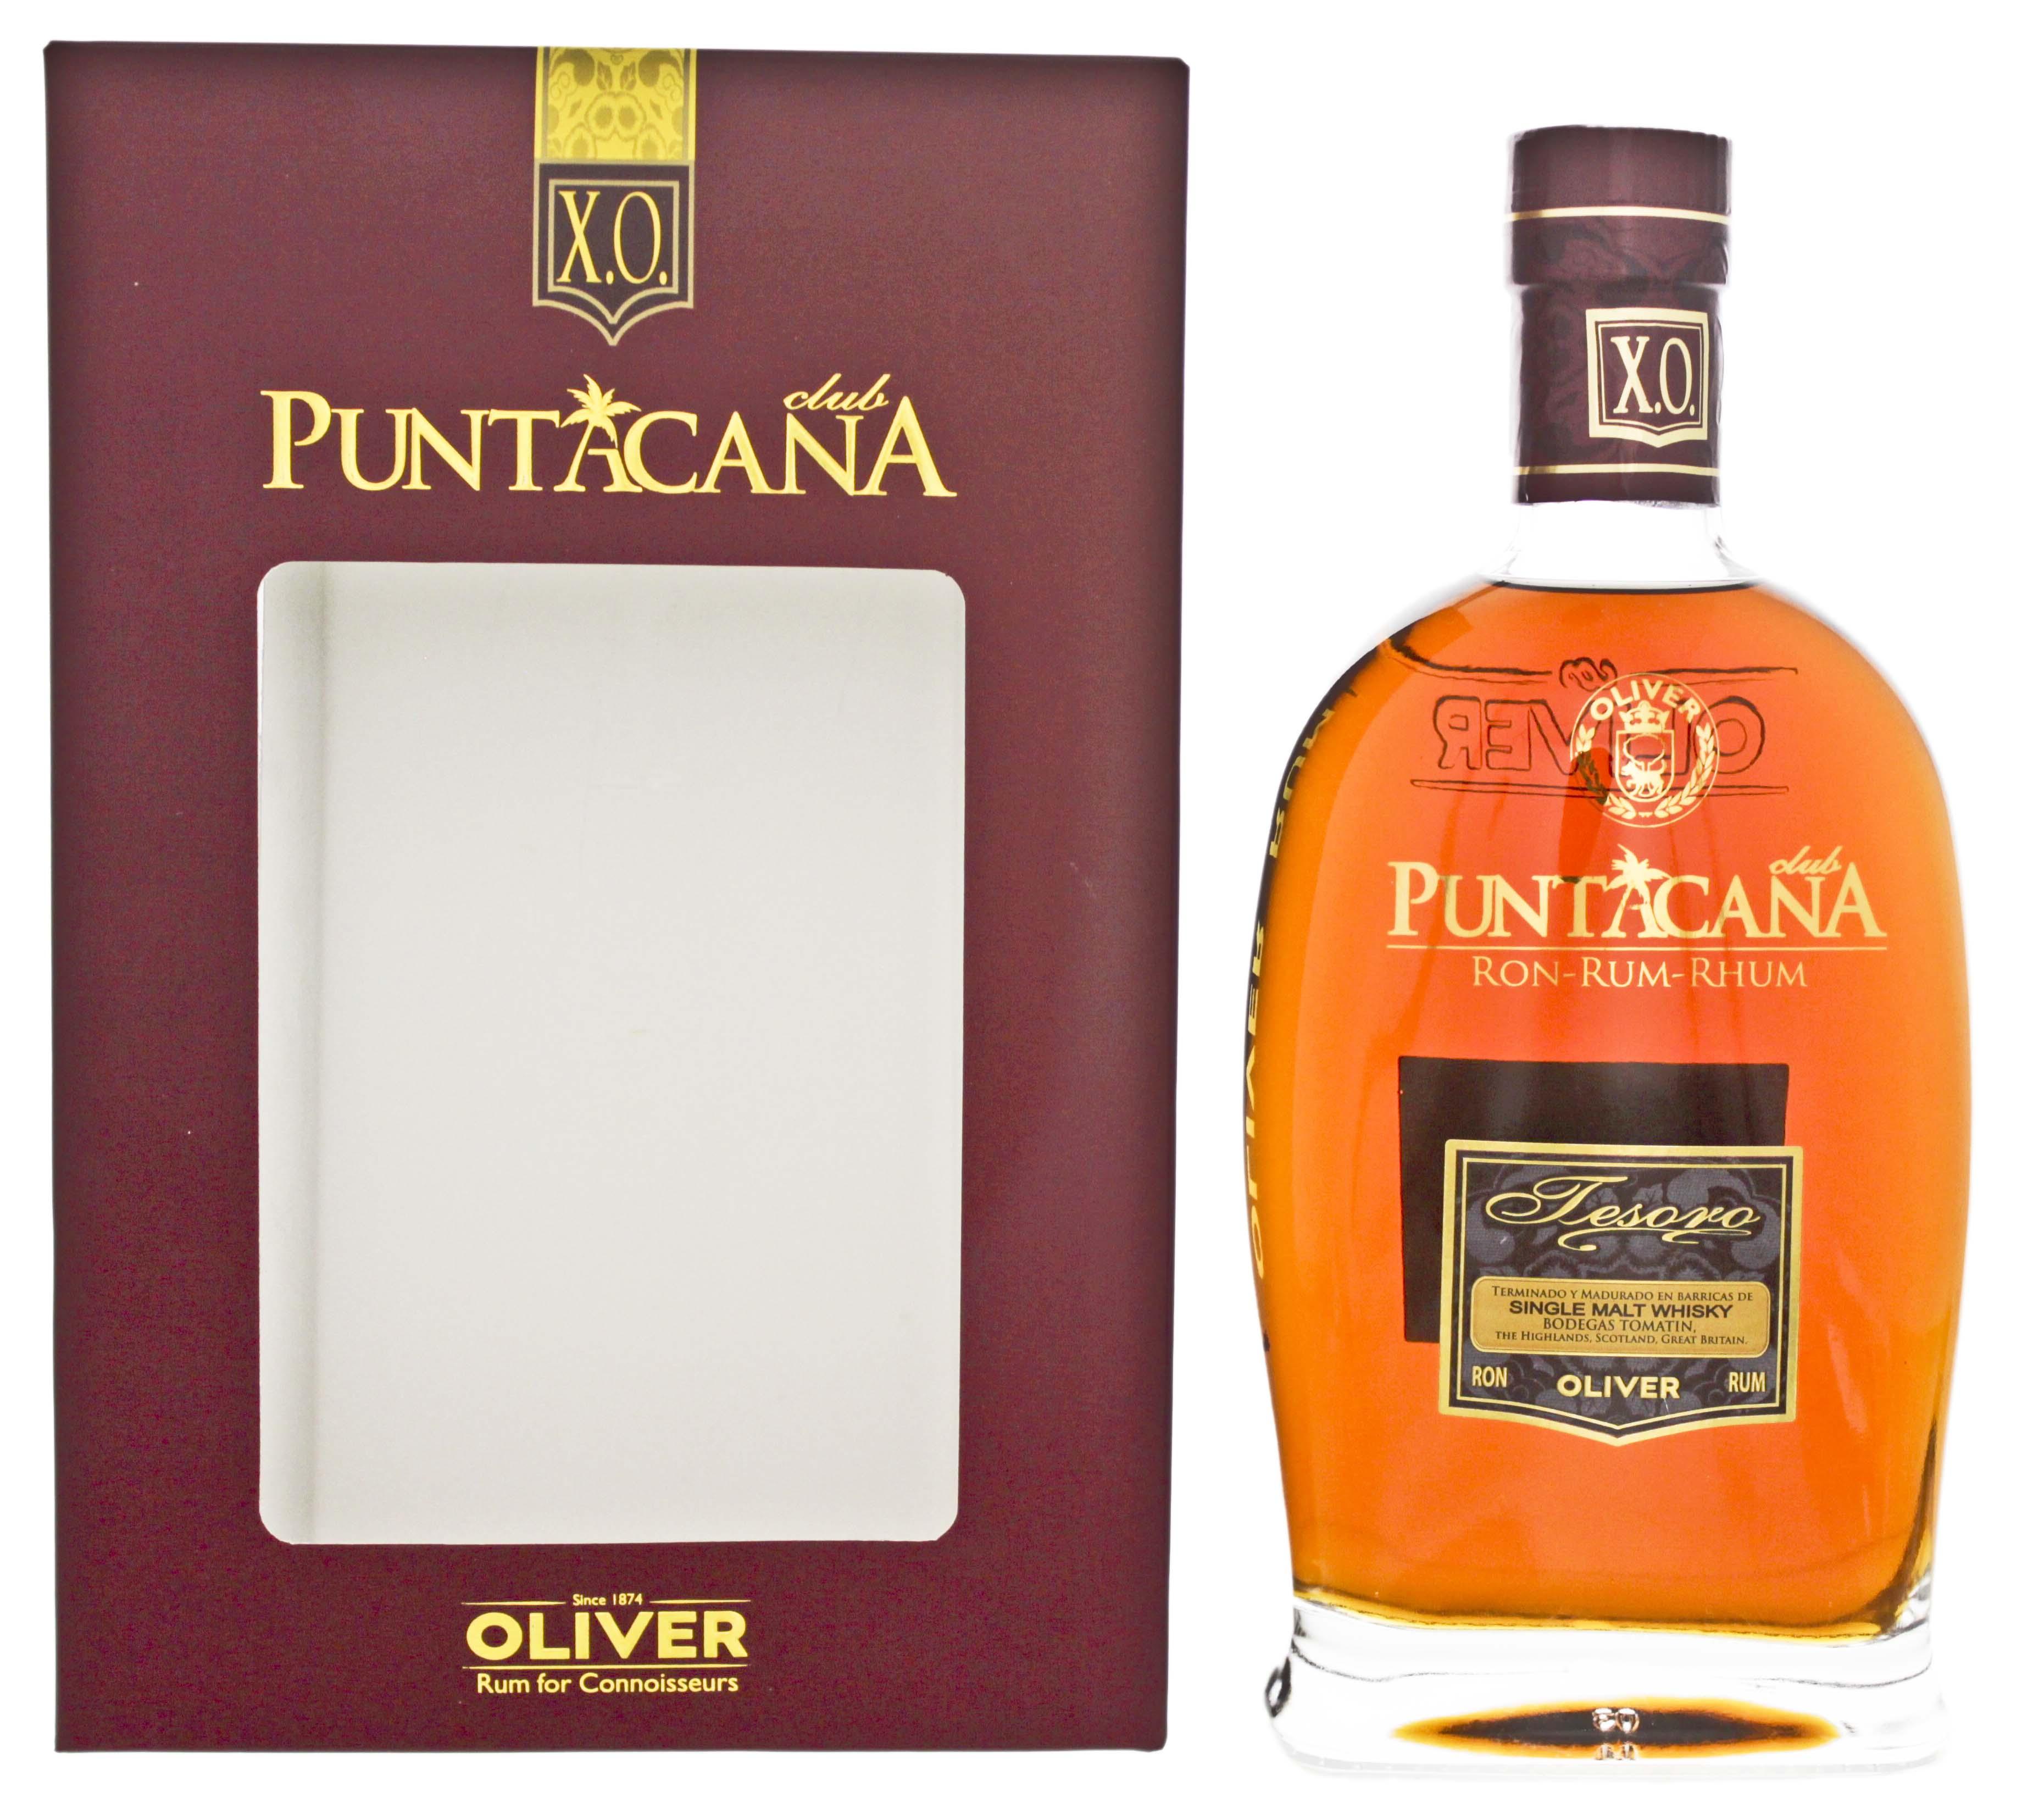 Puntacana Club Tesoro XO Malt Whisky Finish 0,7L